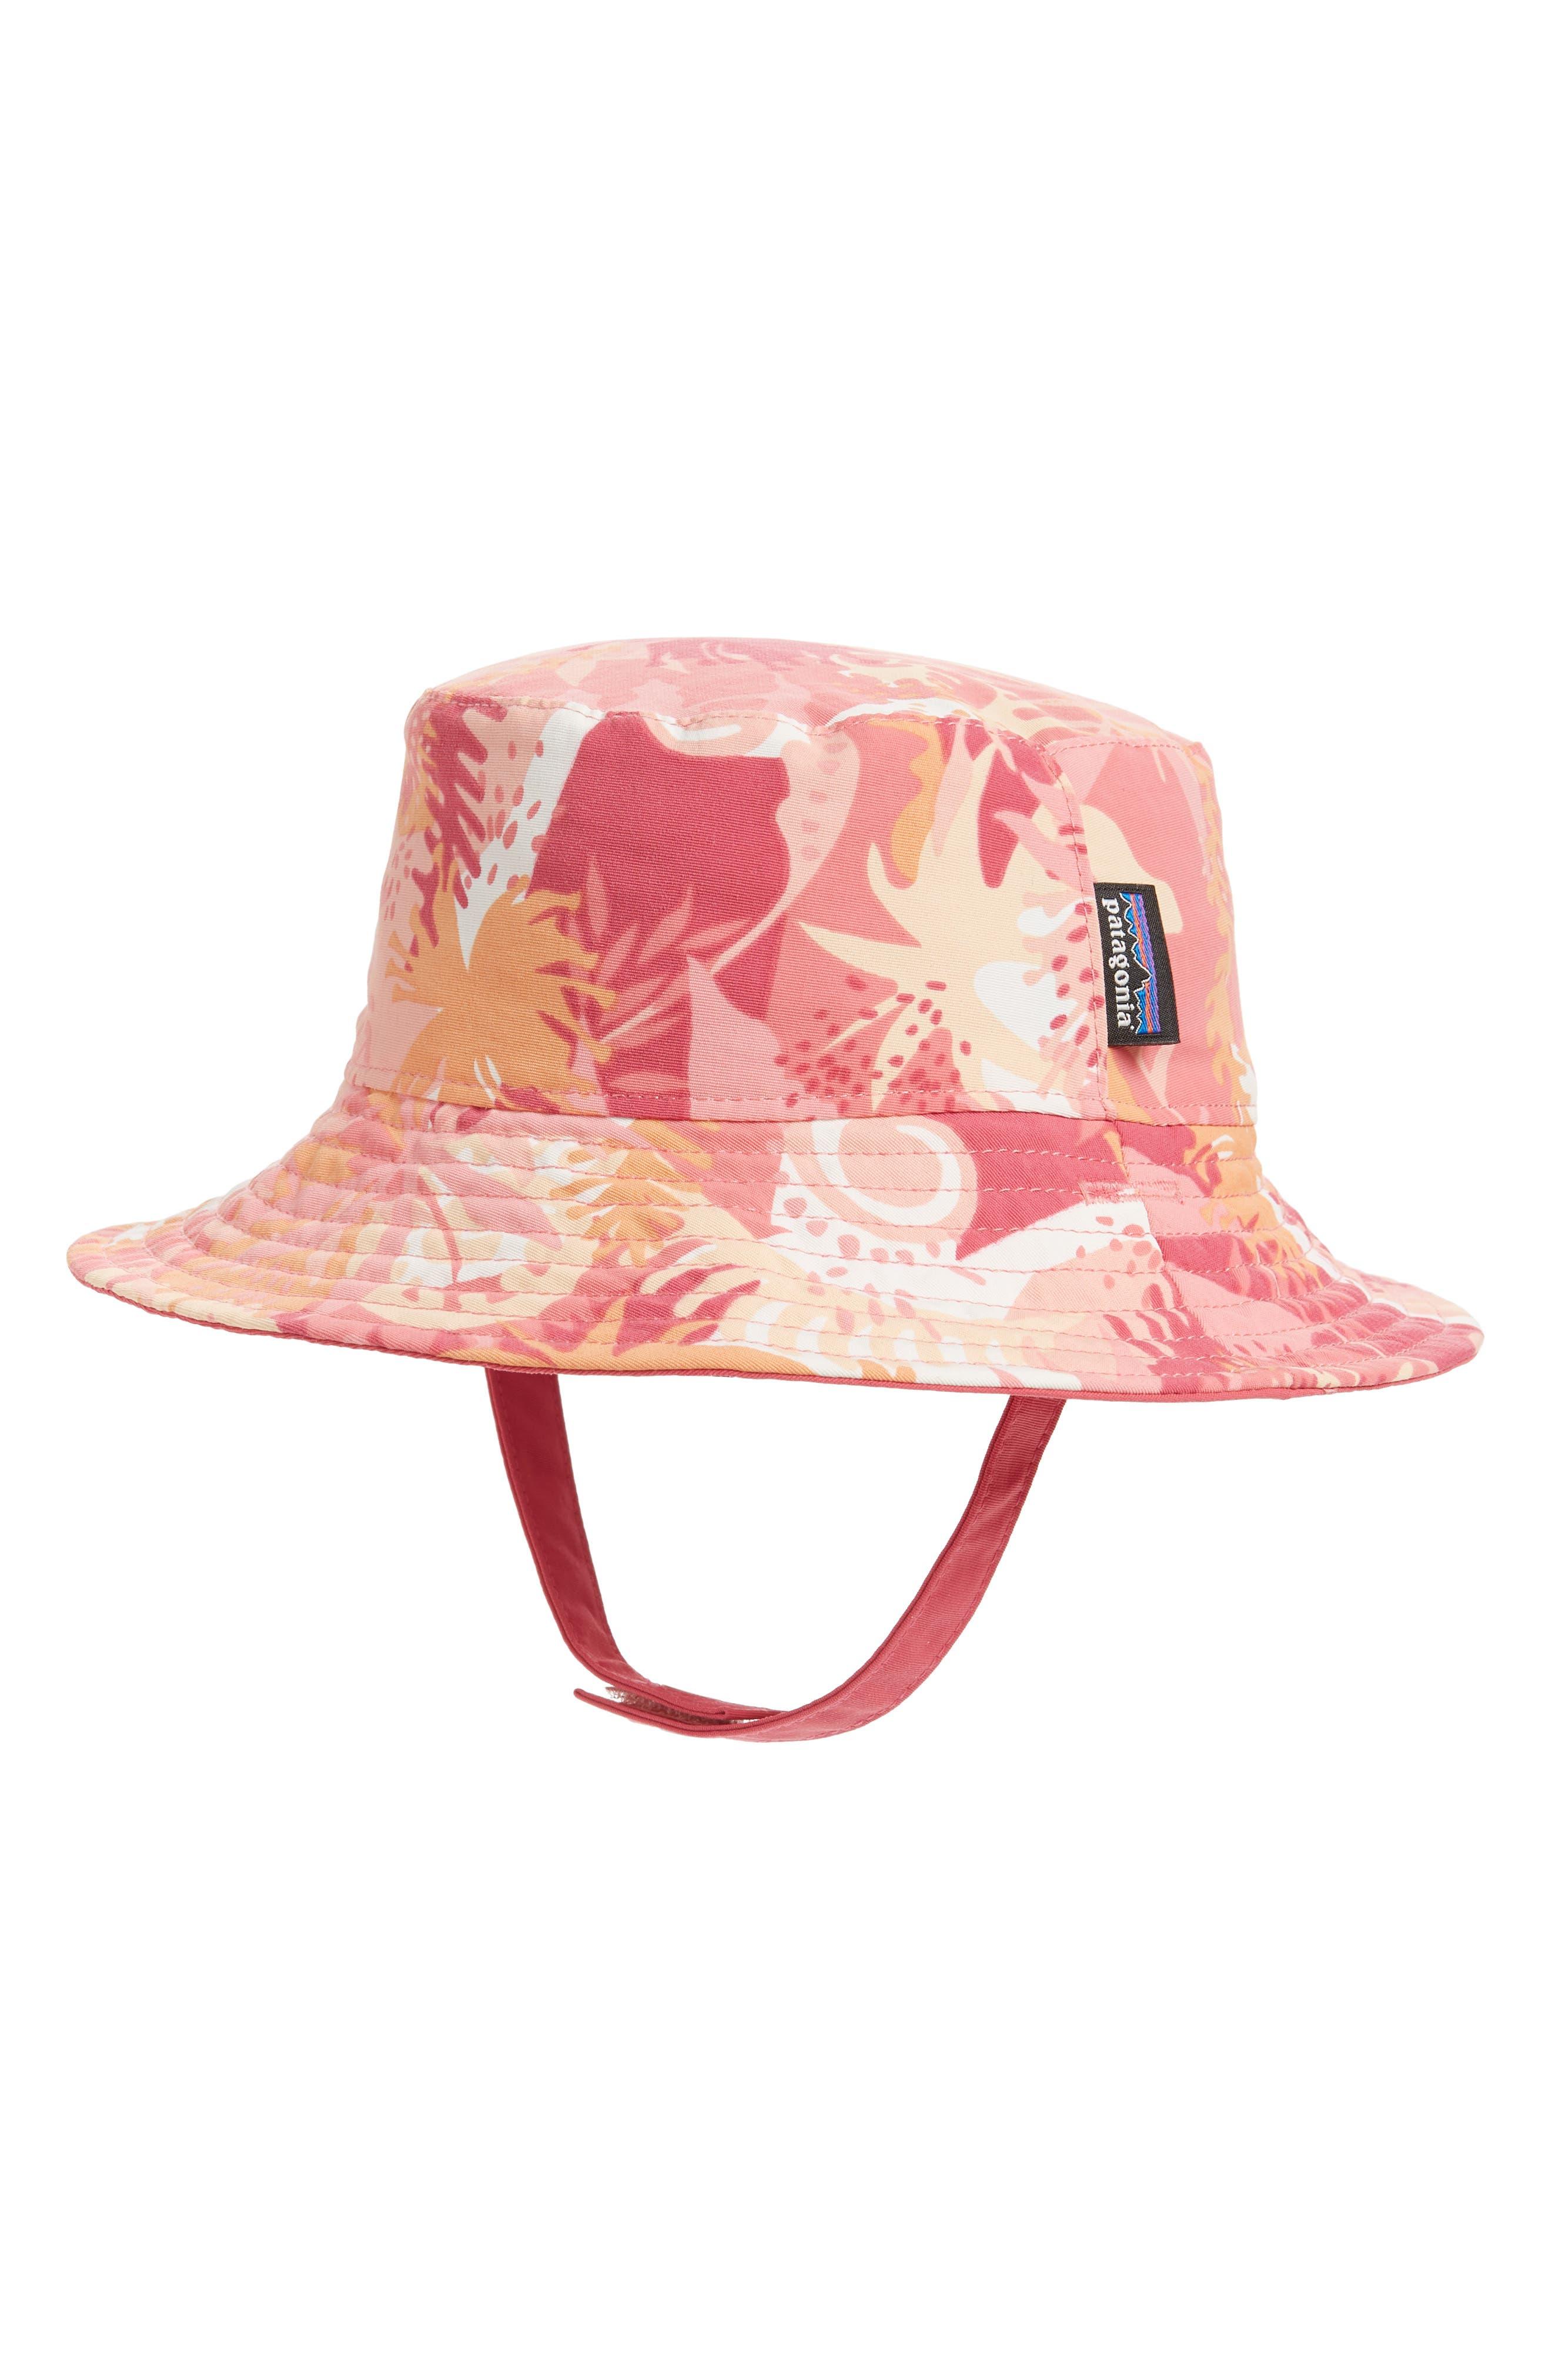 PATAGONIA, Bucket Hat, Main thumbnail 1, color, WILD WARATAH/ PETRA PINK